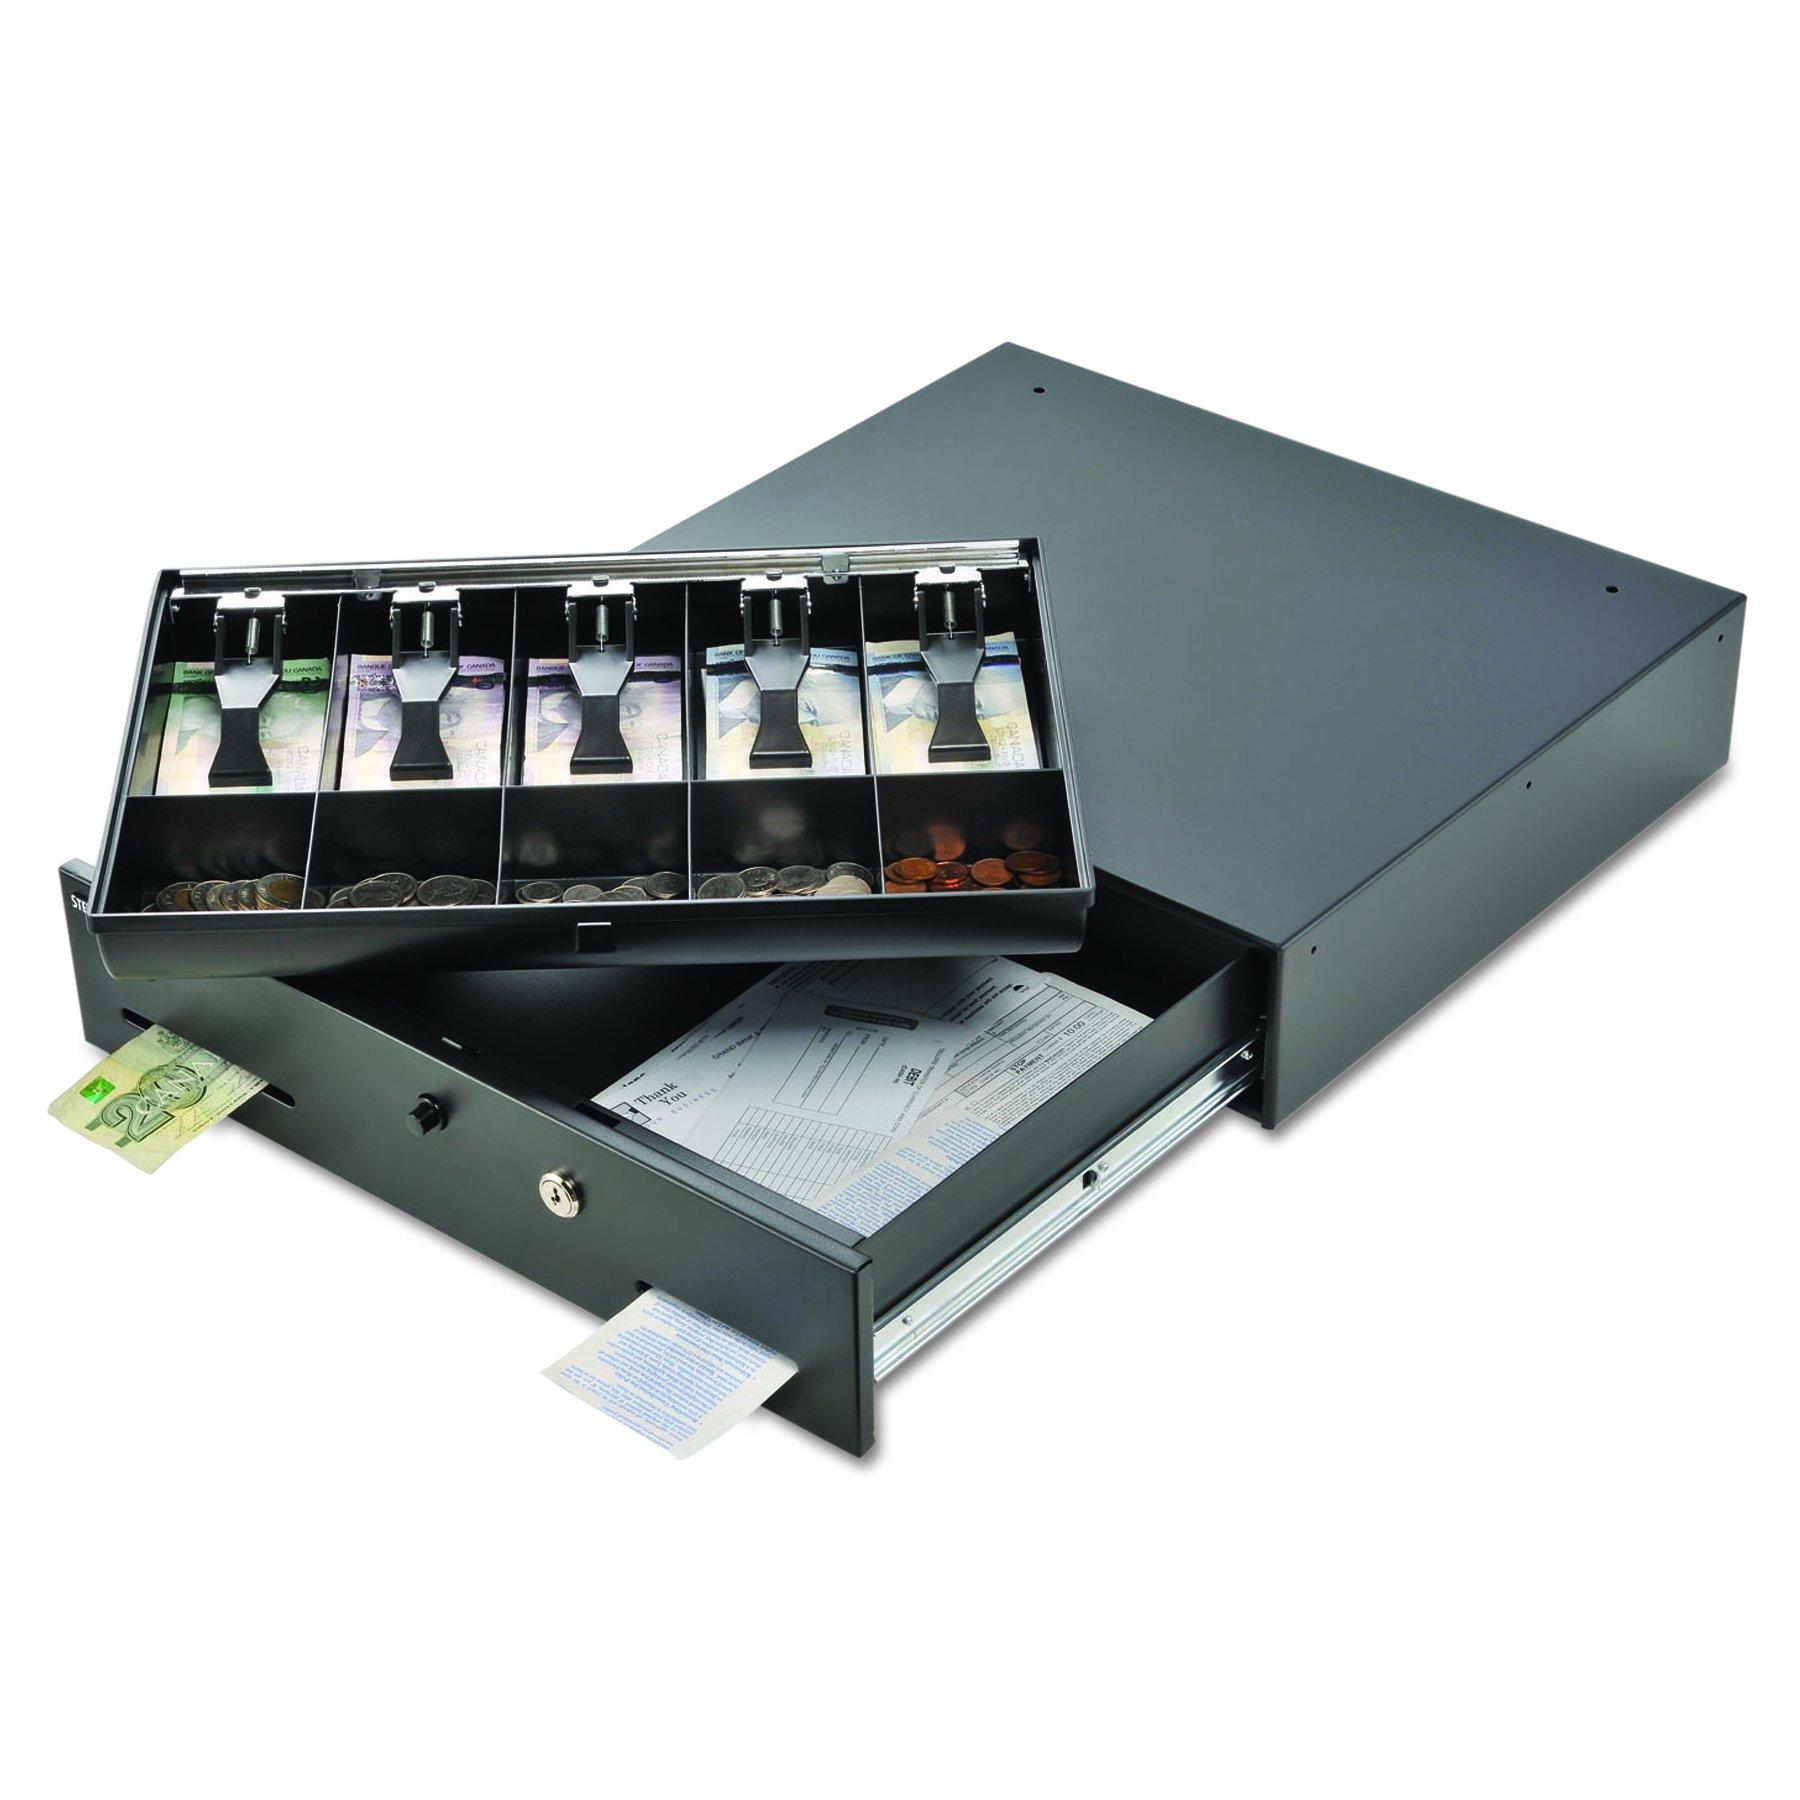 SteelMaster 225106001 Alarm Alert Steel Cash Drawer w/Key & Push-Button Release Lock, Black